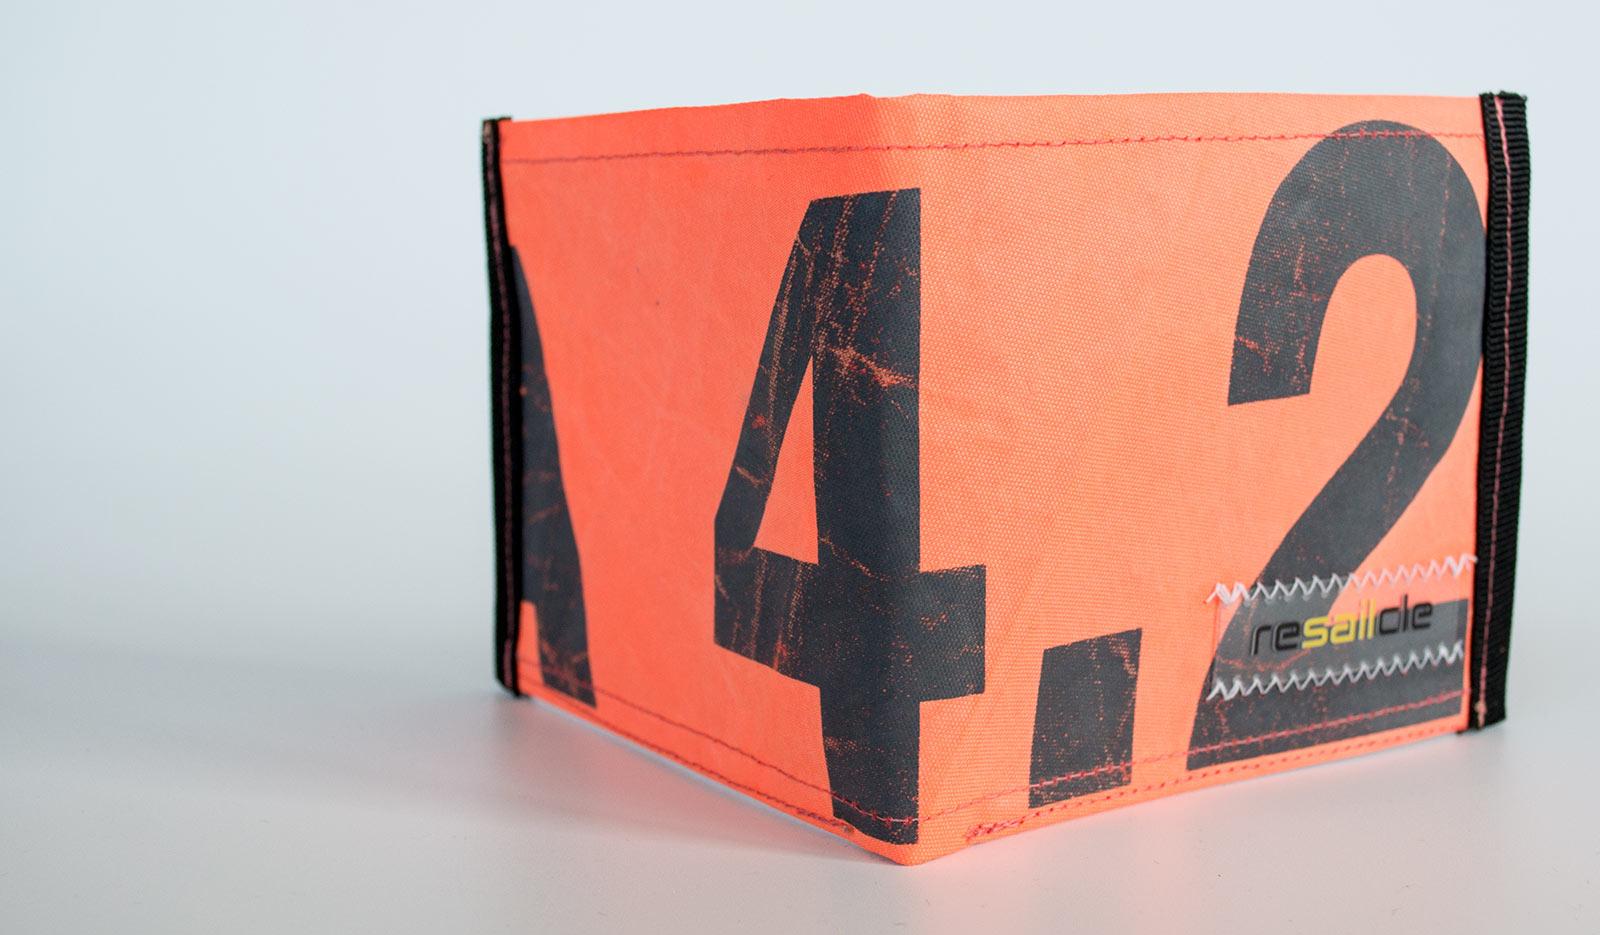 ReSailCle - North Zeta 4.2 wallet